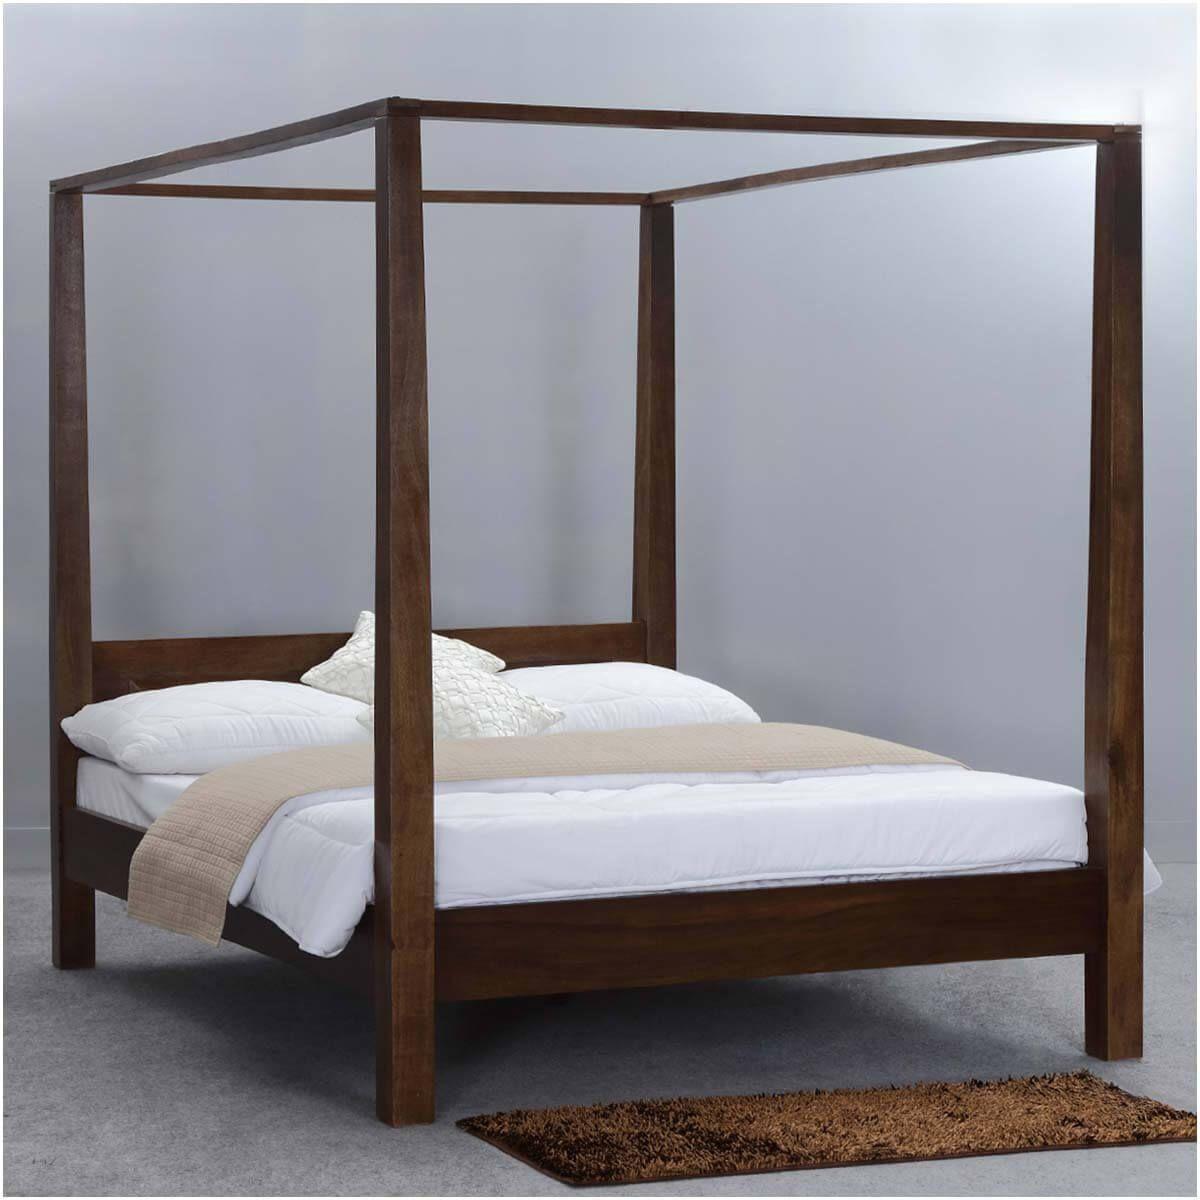 Modern Rustic Philadelphia Solid Wood Platform Canopy Bed Platform Canopy Bed